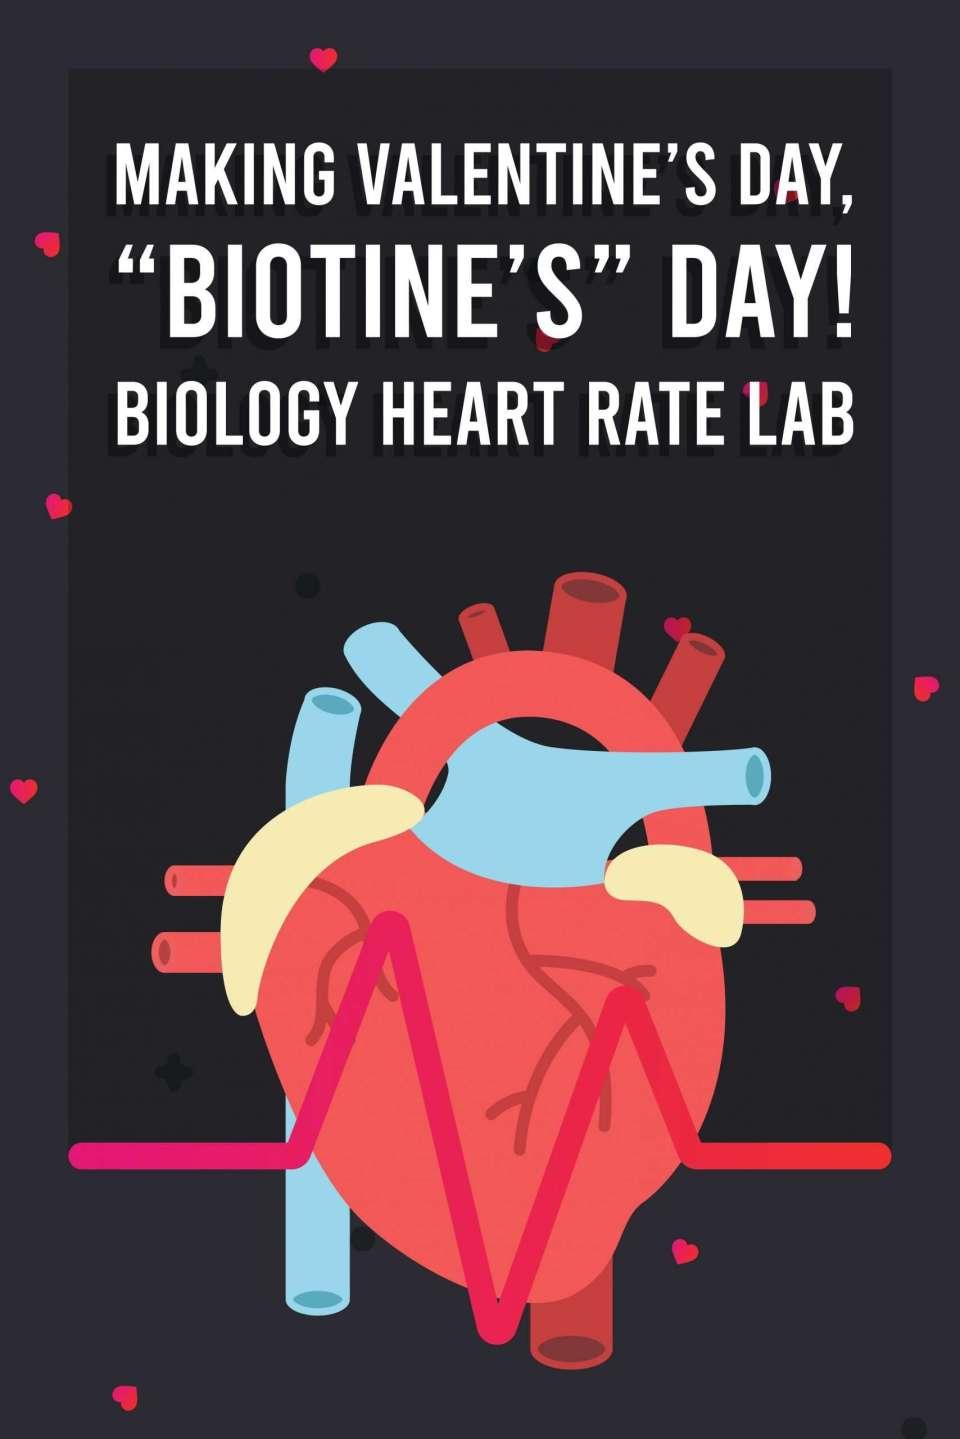 Target Heart Rate Zones Beats Per Minute, biology valentines day card, valentine's day biology, valentine's day biology jokes, valentine's day biology activity, valentine's day biology worksheet, Making Valentine's Day Biotine's Day